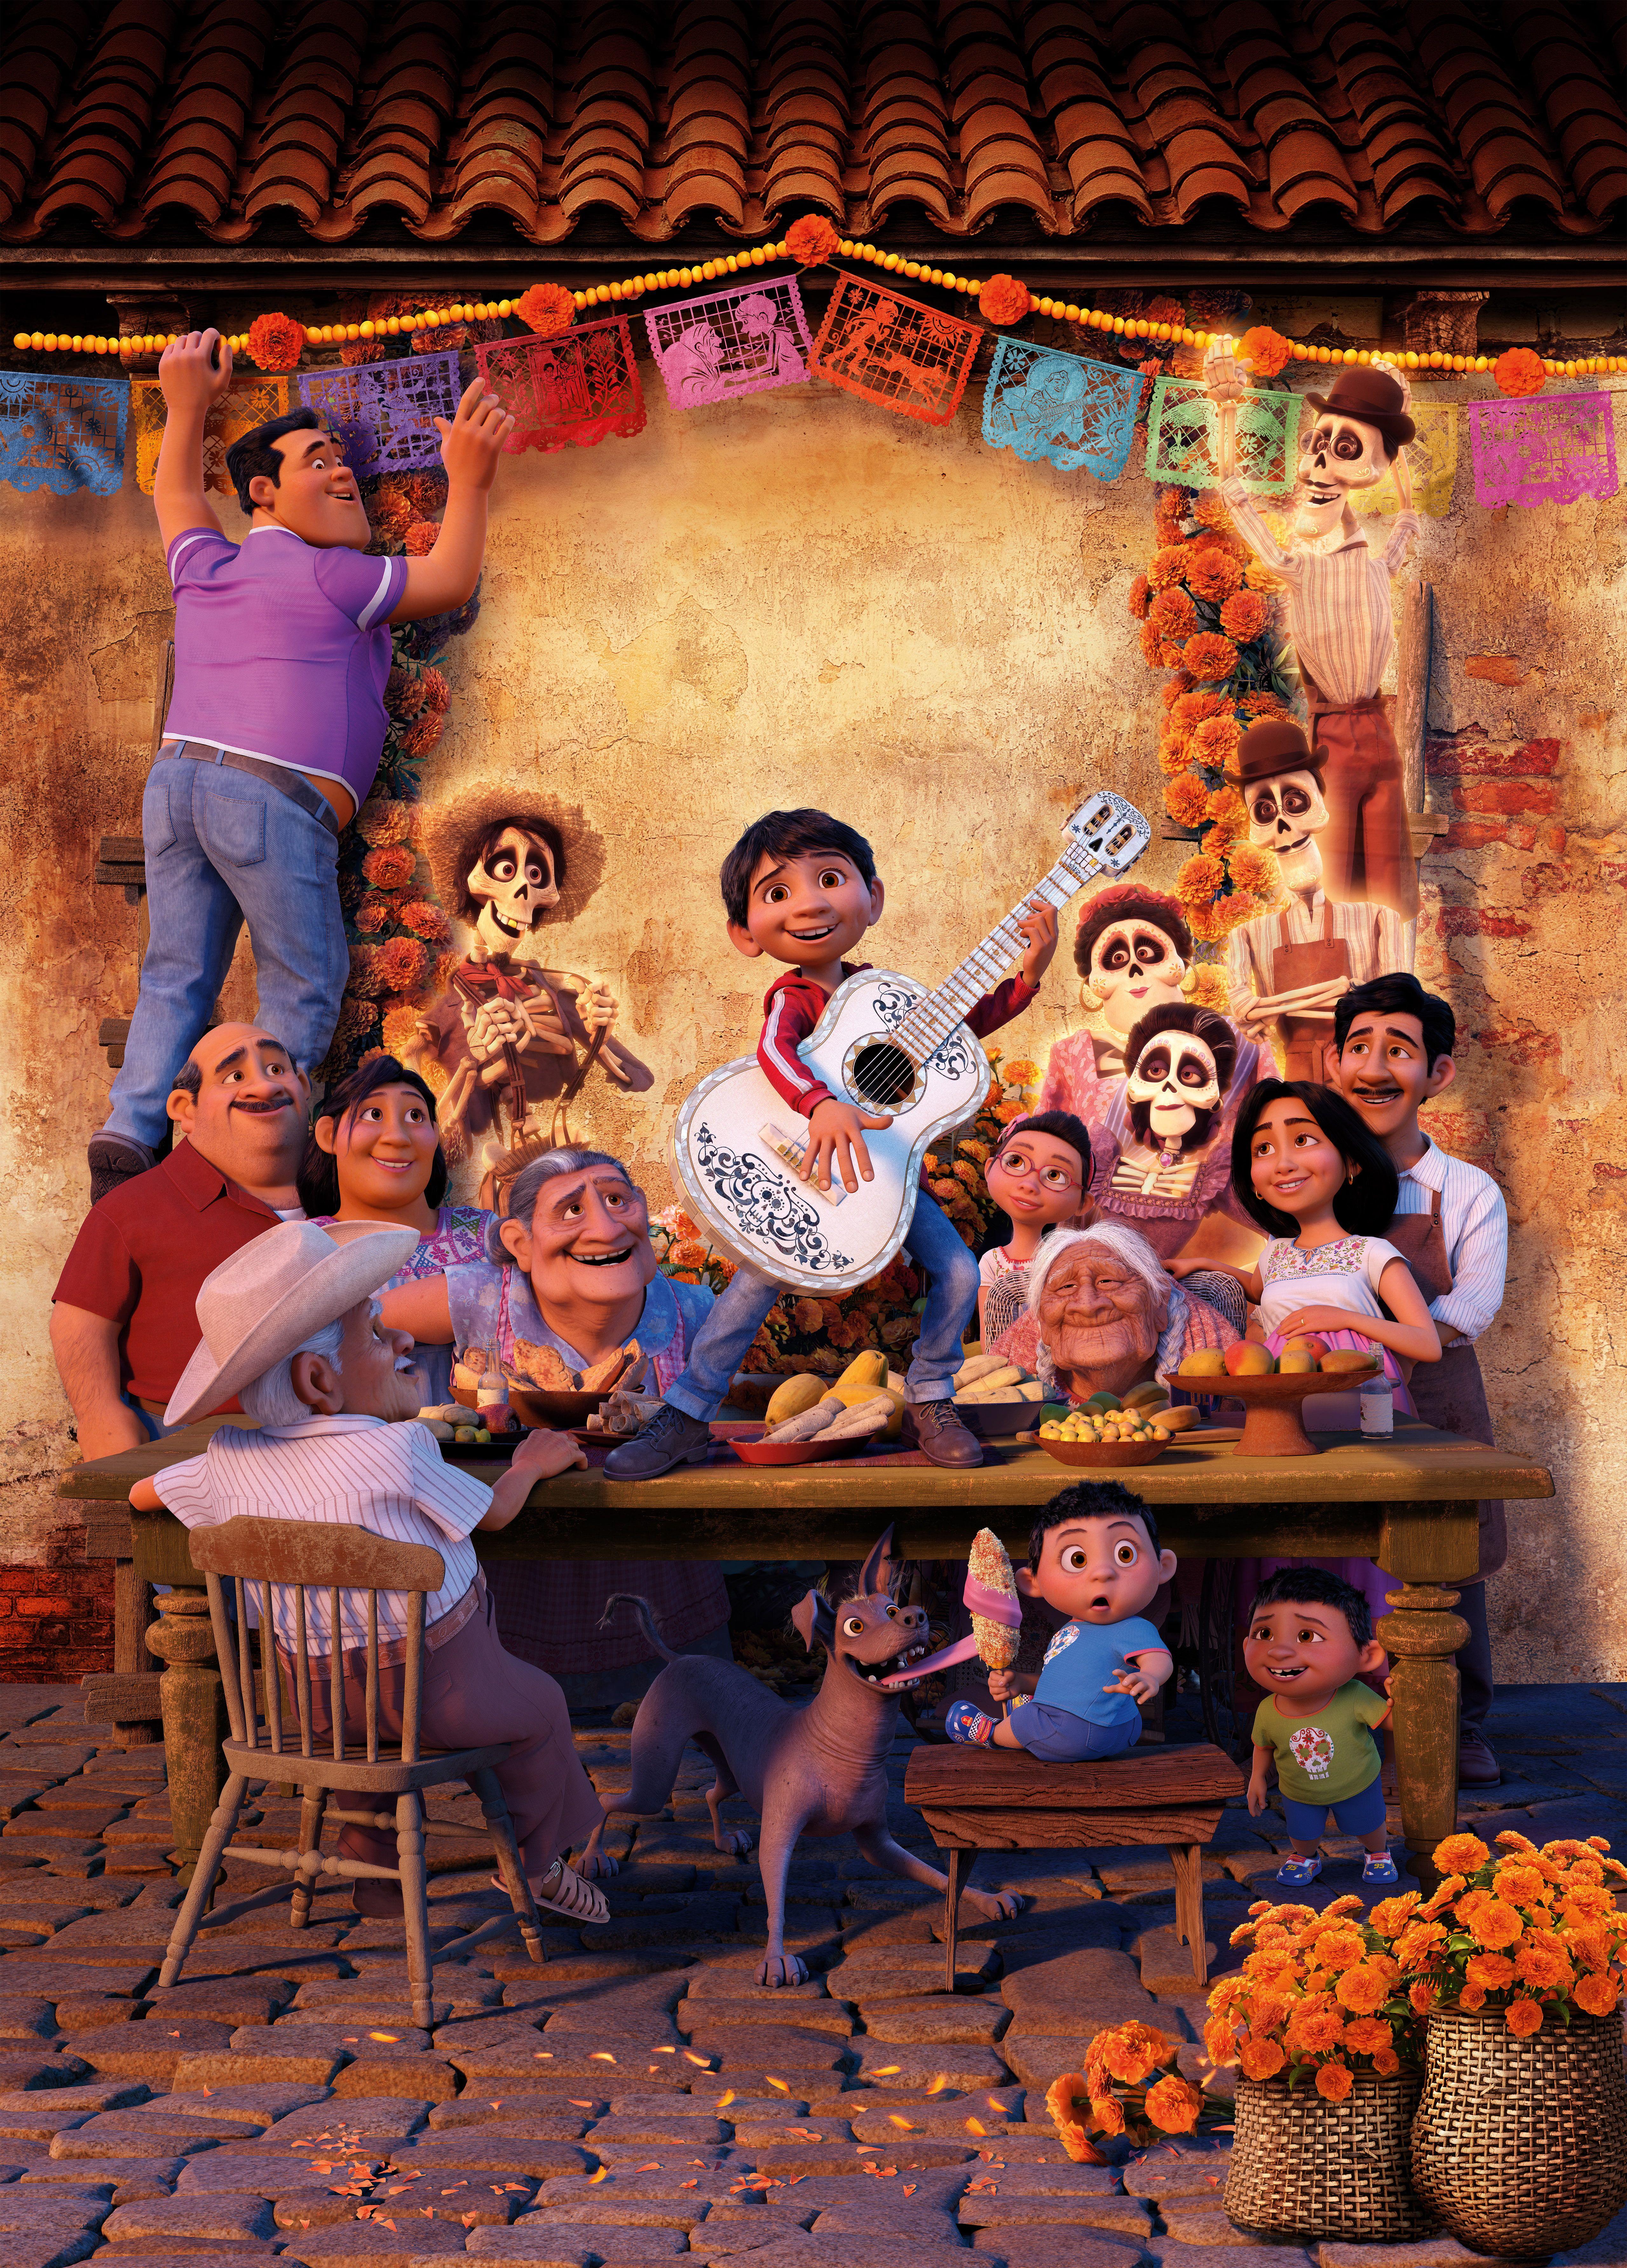 HD wallpaper: Coco, 5K, Pixar, Animation, child, childhood, boys, group of people